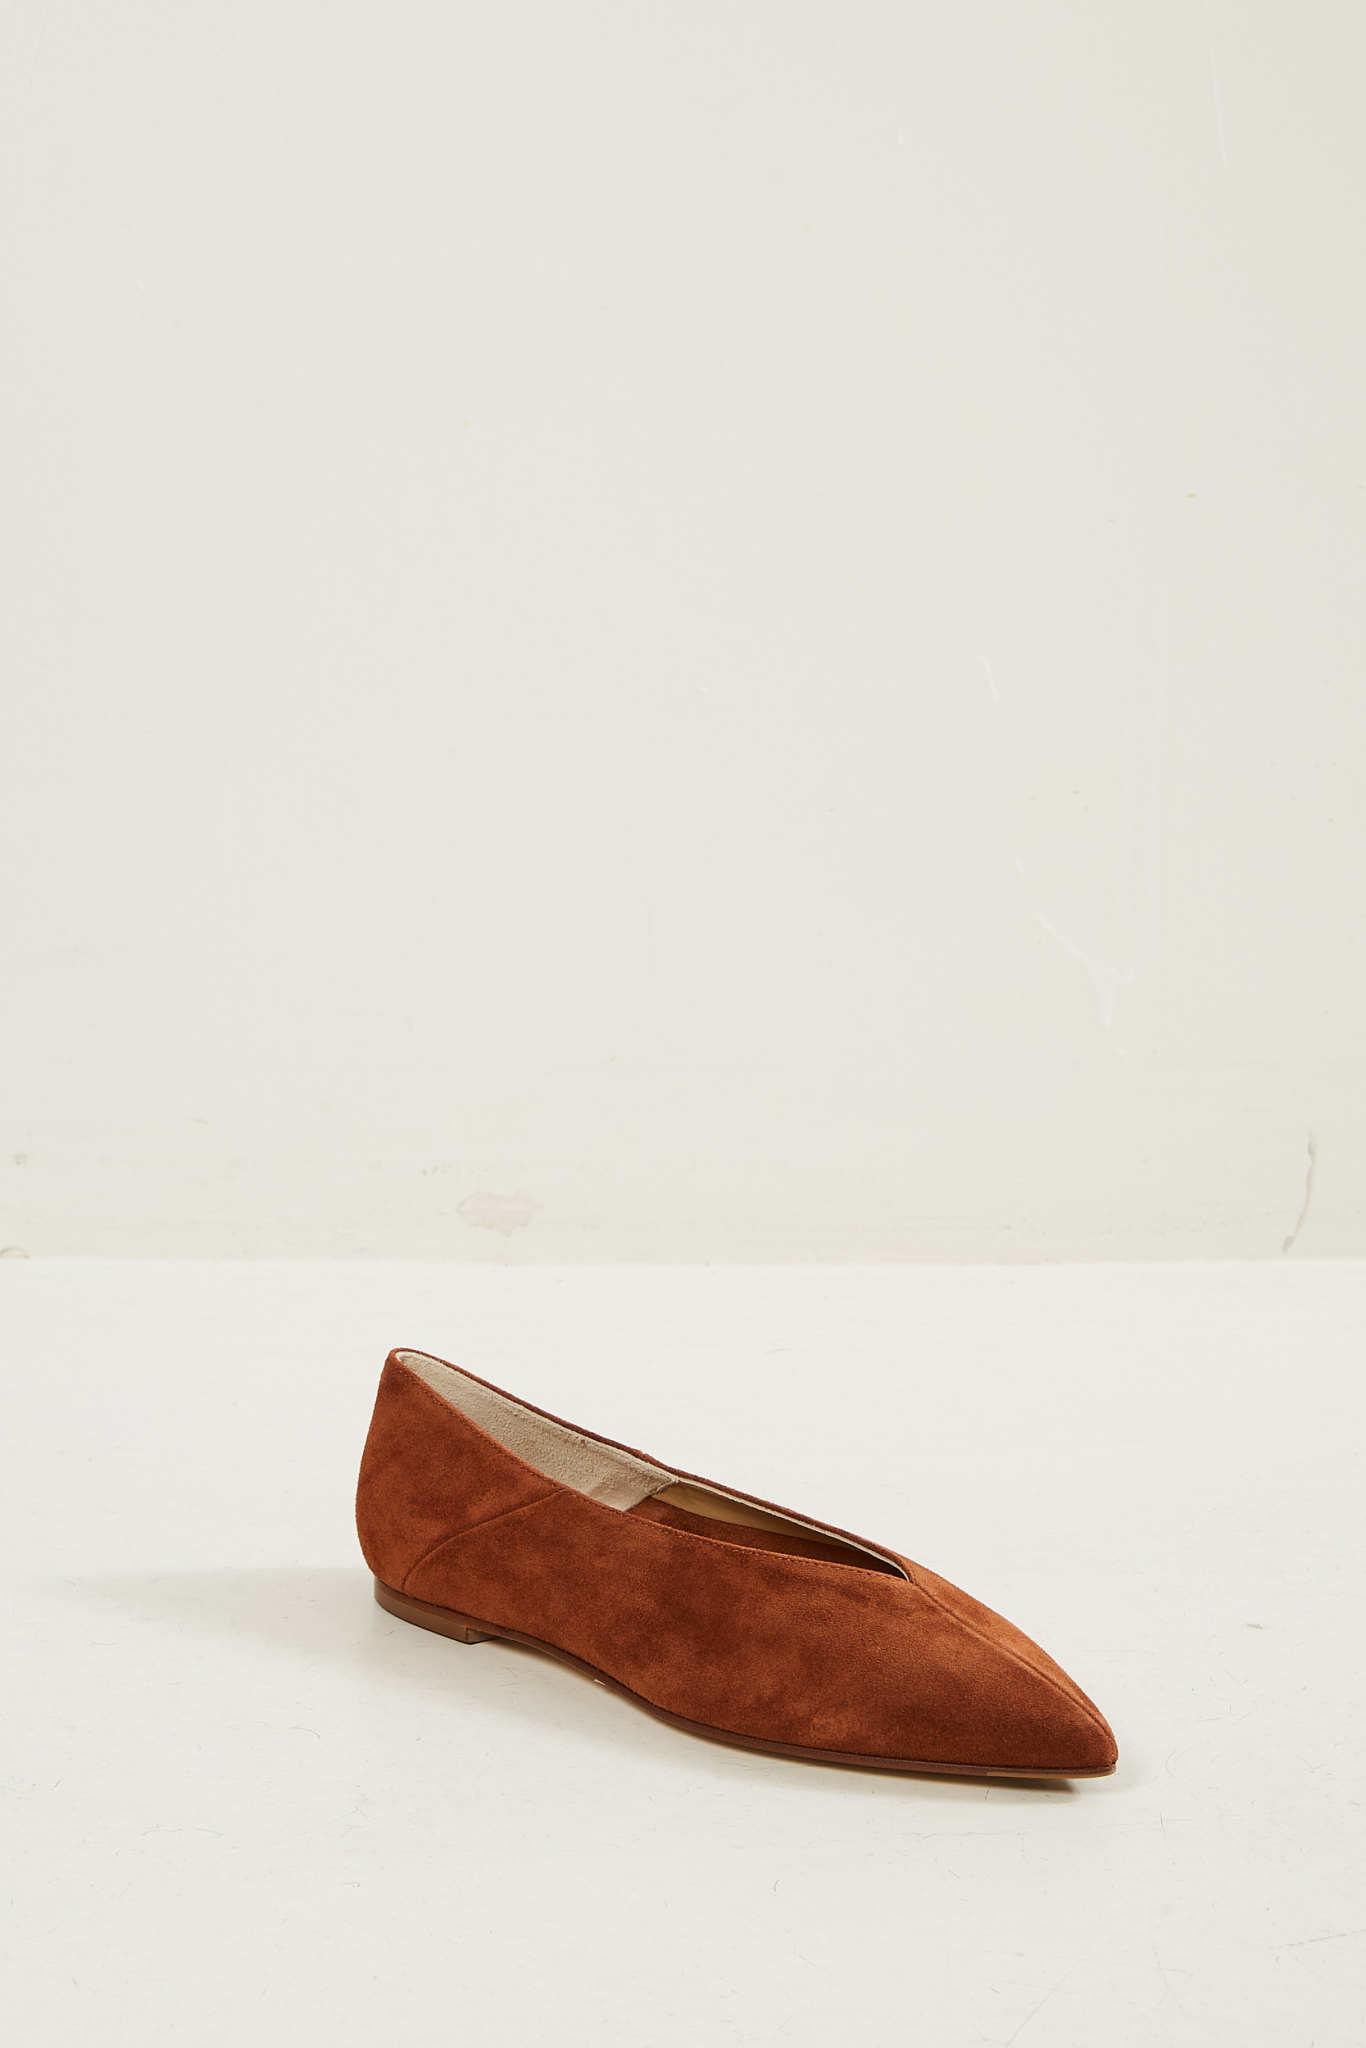 Aeyde Moa ballerina shoes.